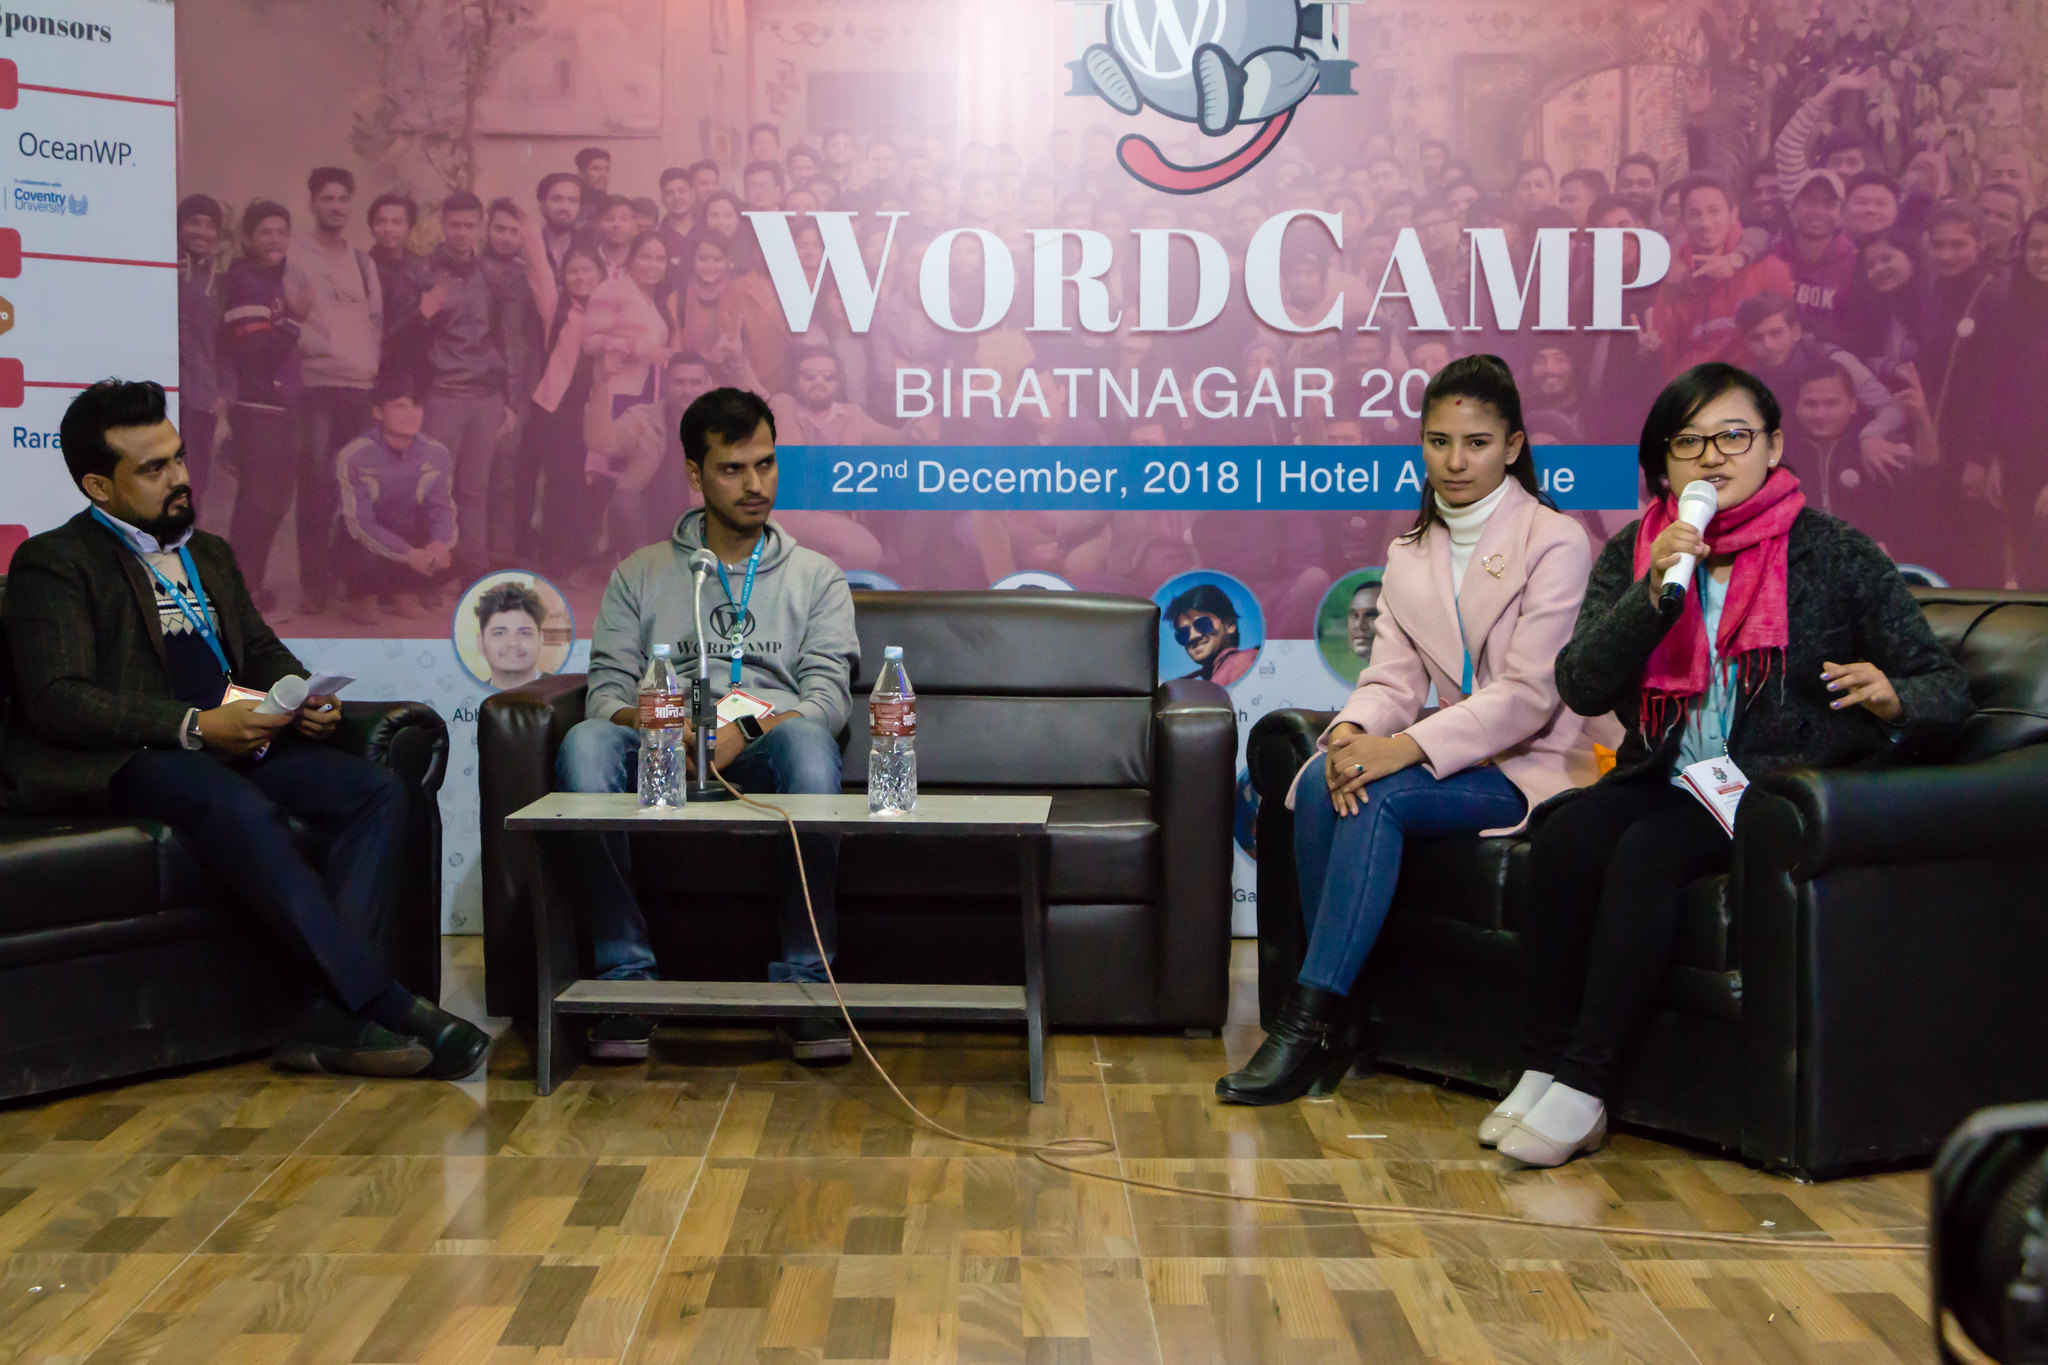 Sunita Rai on a panel at WordCamp